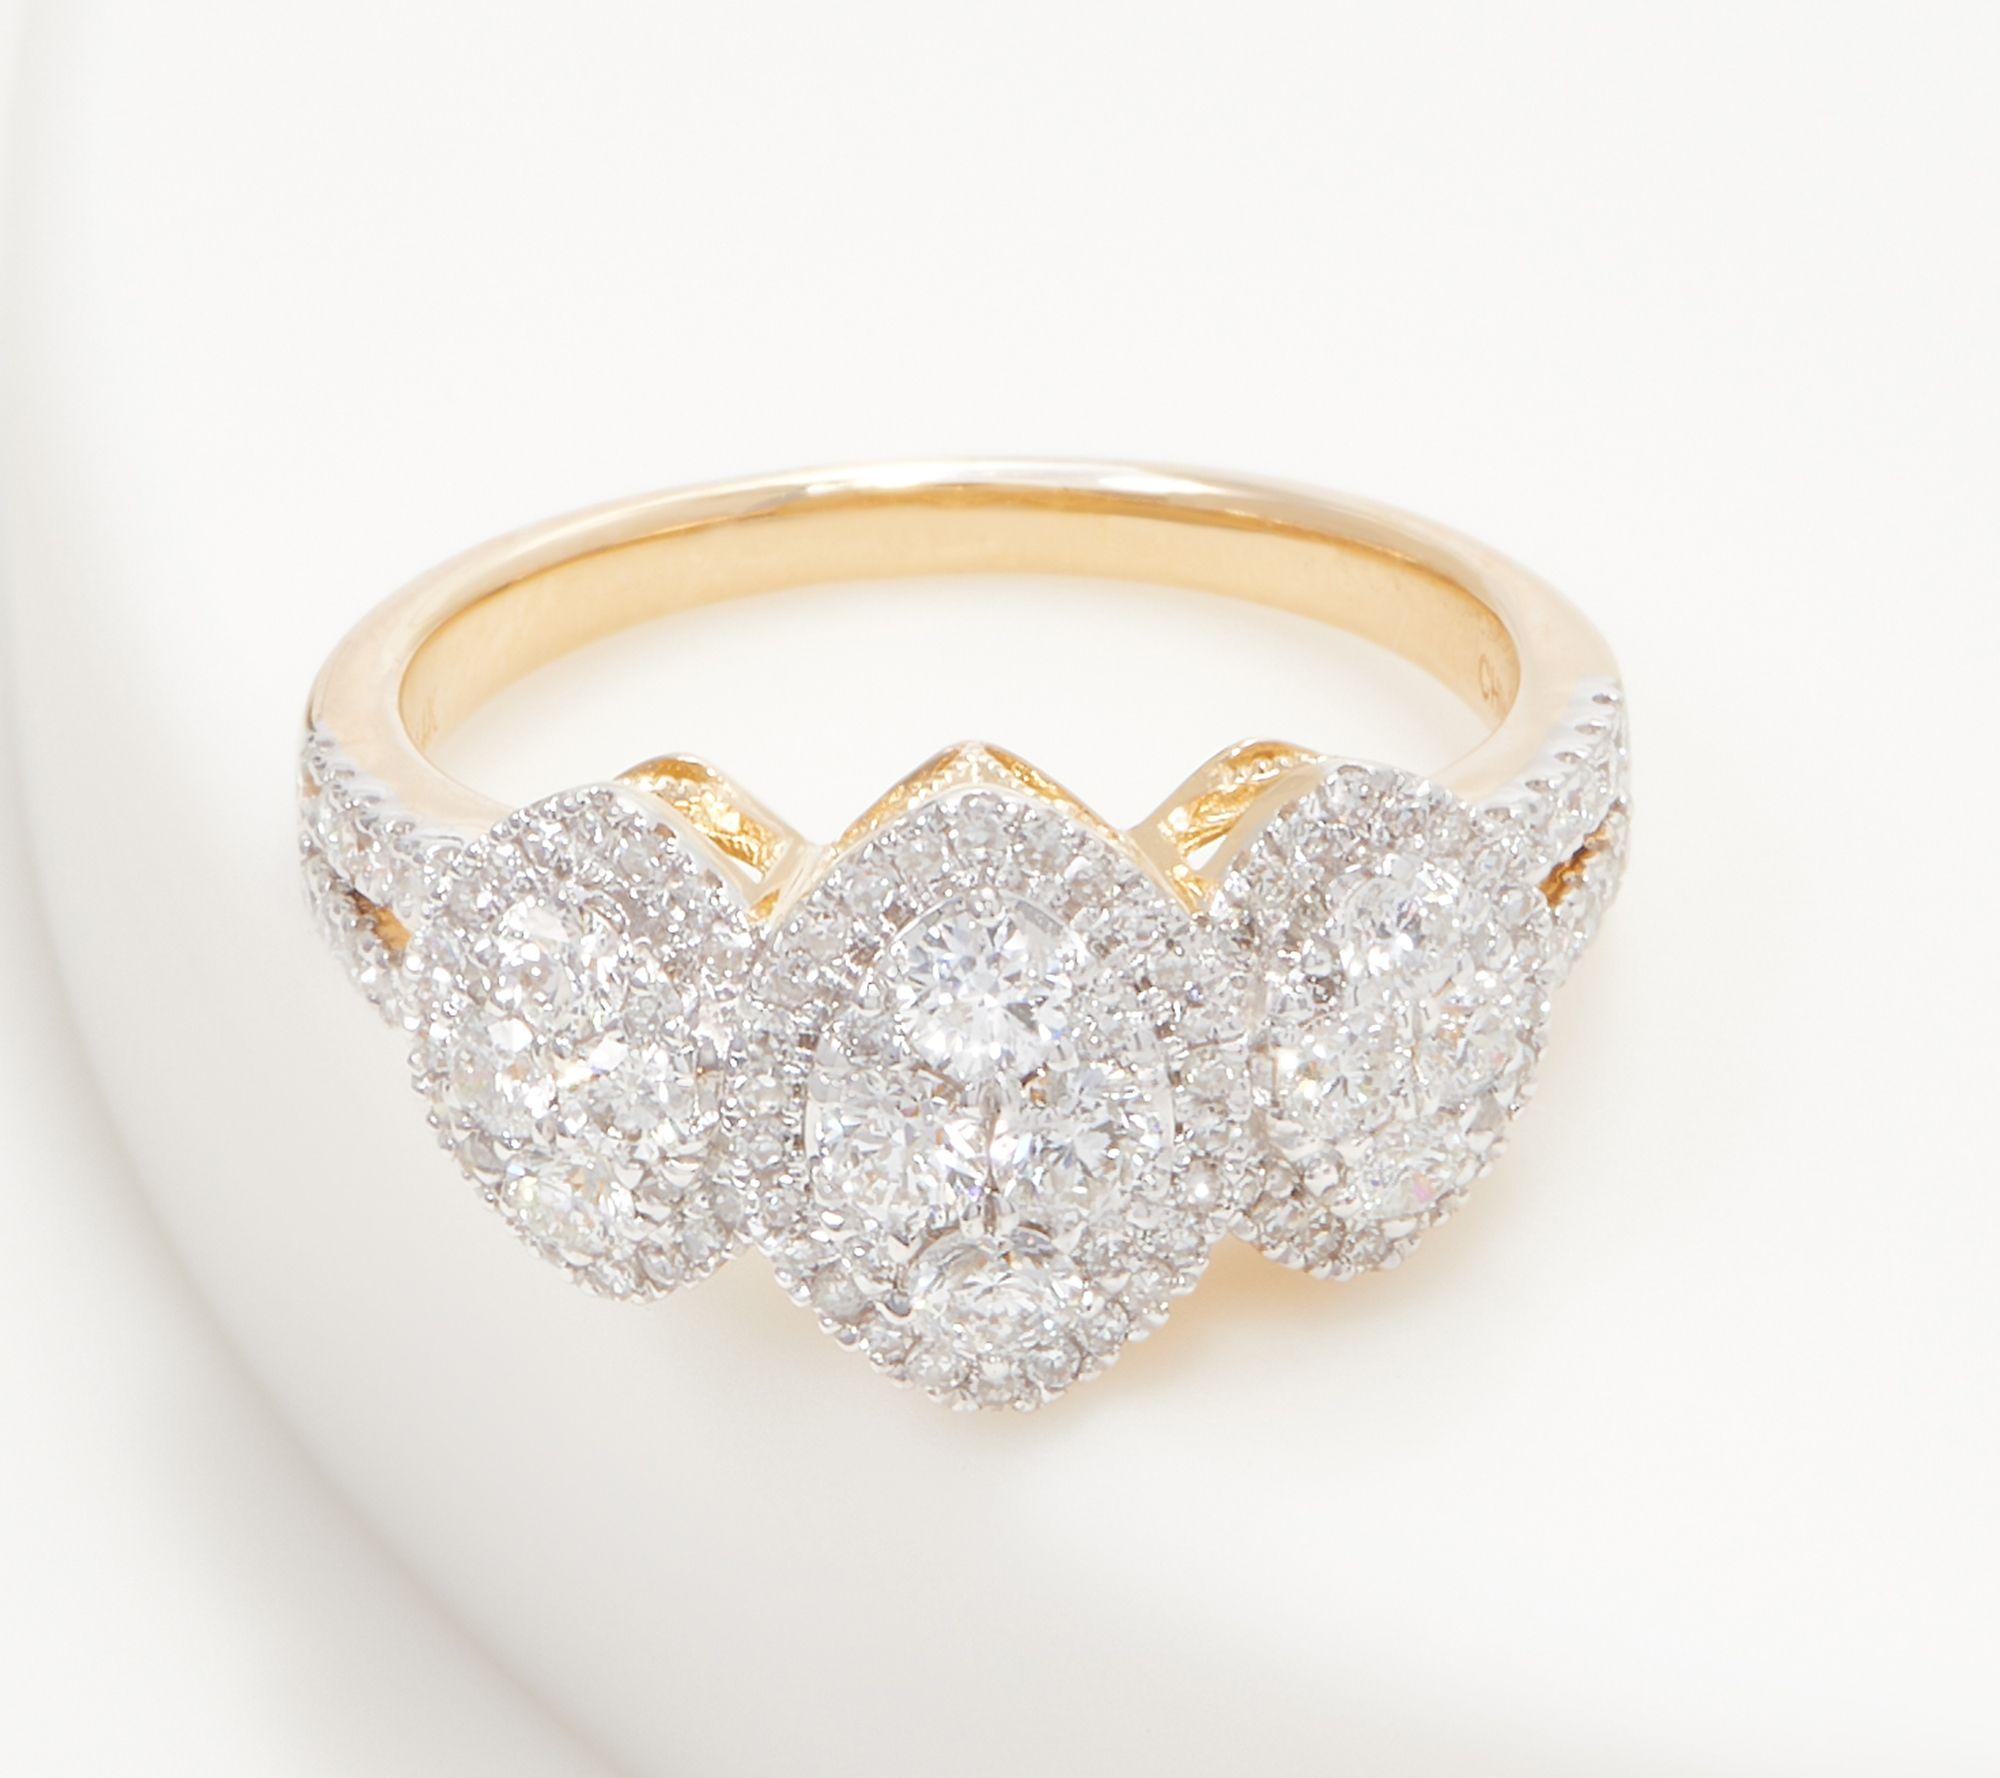 5b0f46687f446 Affinity 14K Gold Marquise Triple Cluster Diamond Ring, 1.00cttw — QVC.com